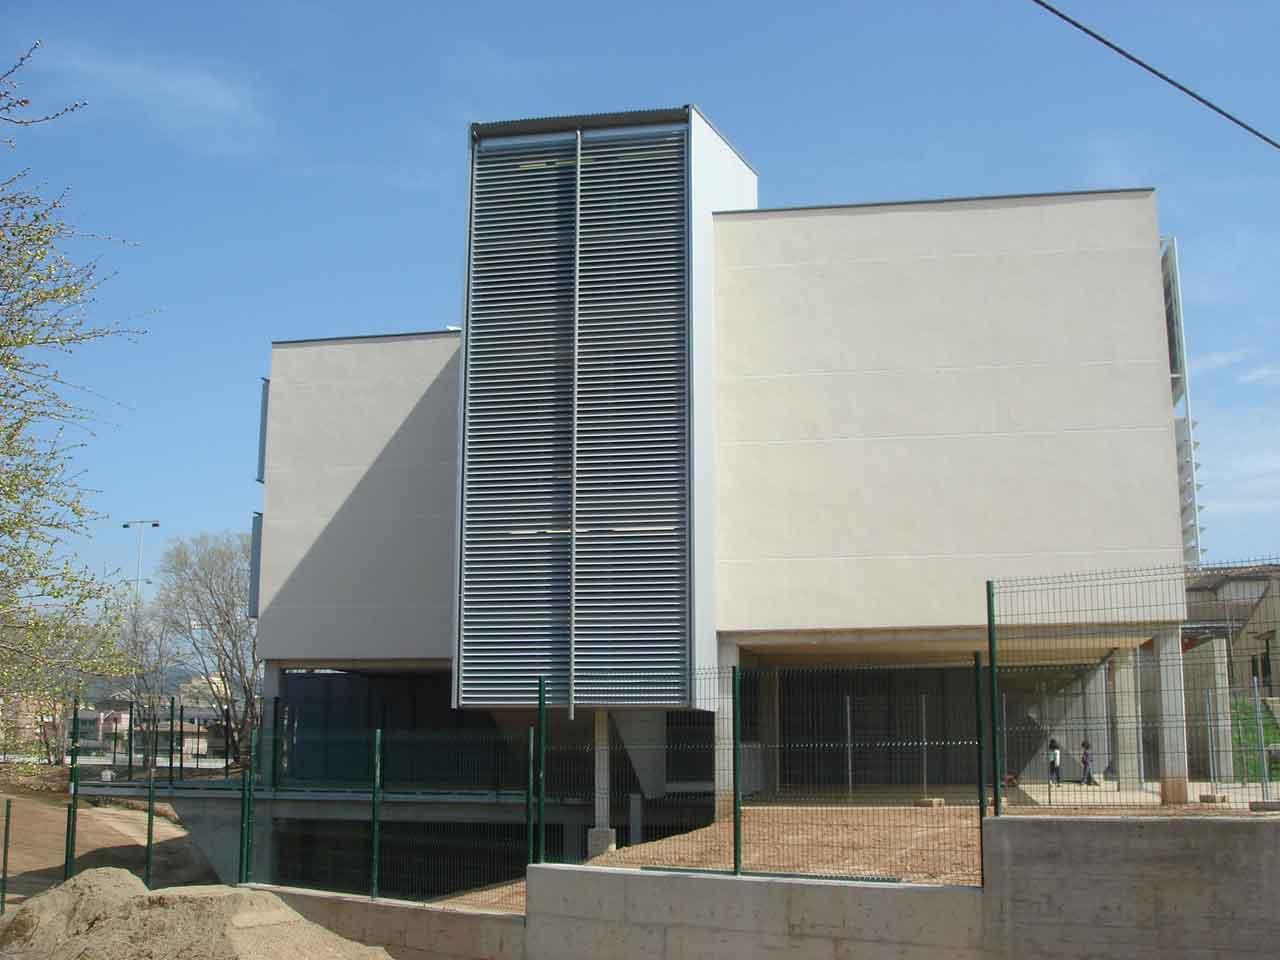 CEIP-ARTESA-2010-04-10-004.jpg